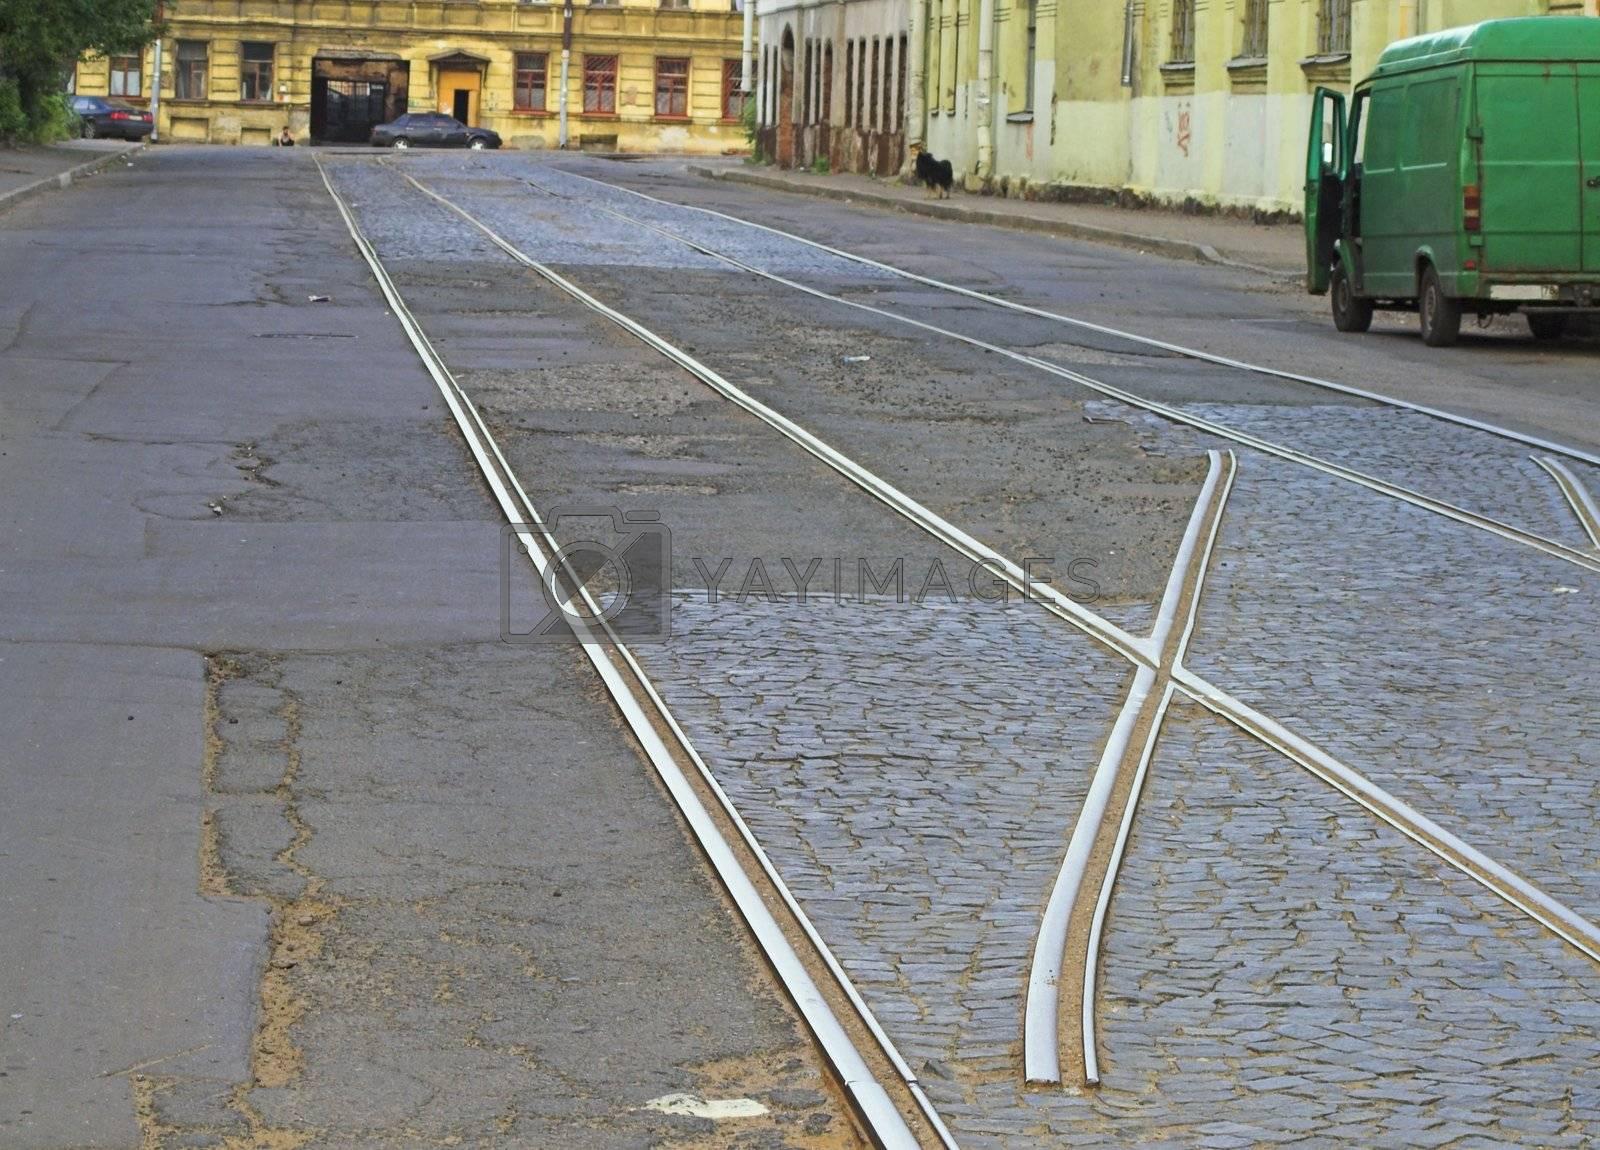 Tram lines at city street